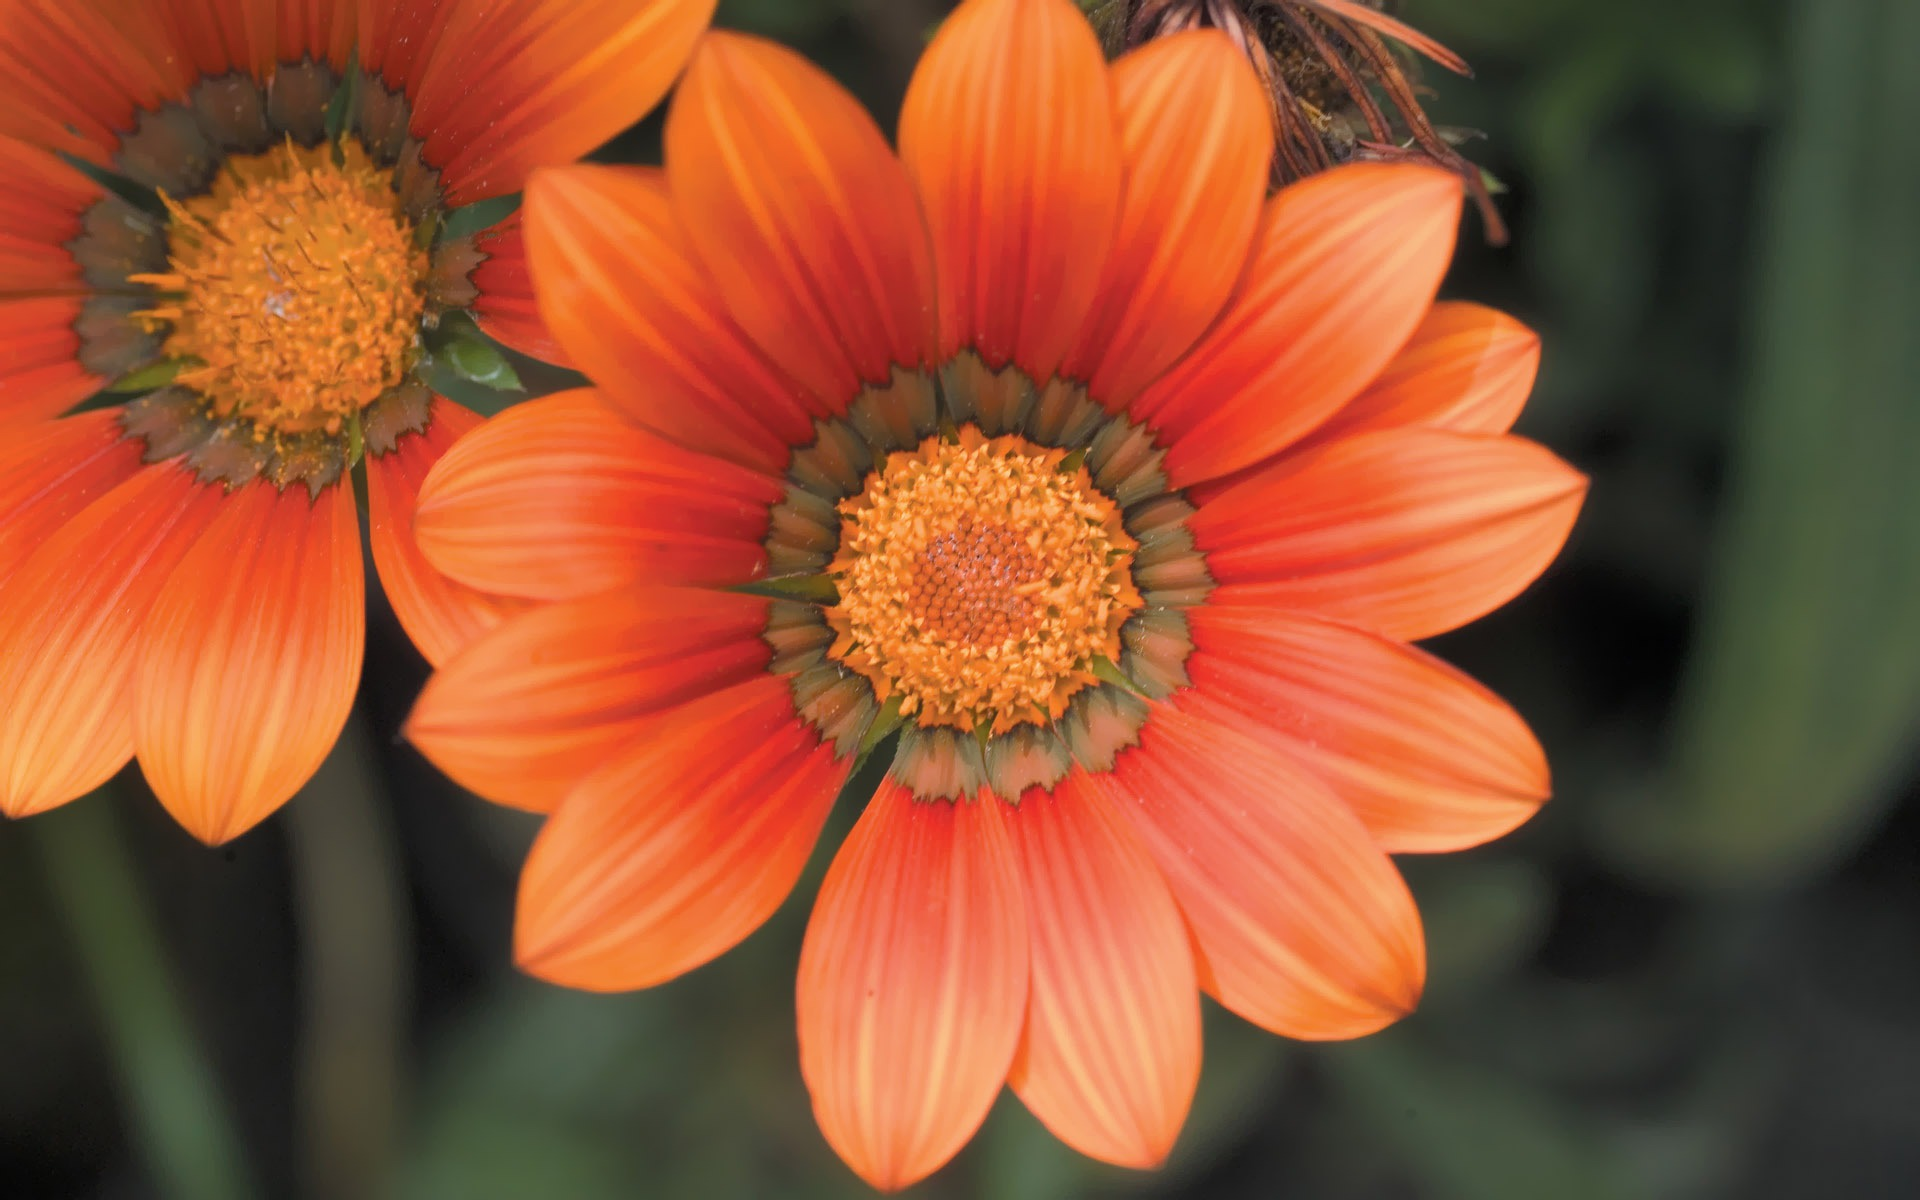 Orange Dahlia Flower Picture Preview 10wallpaper